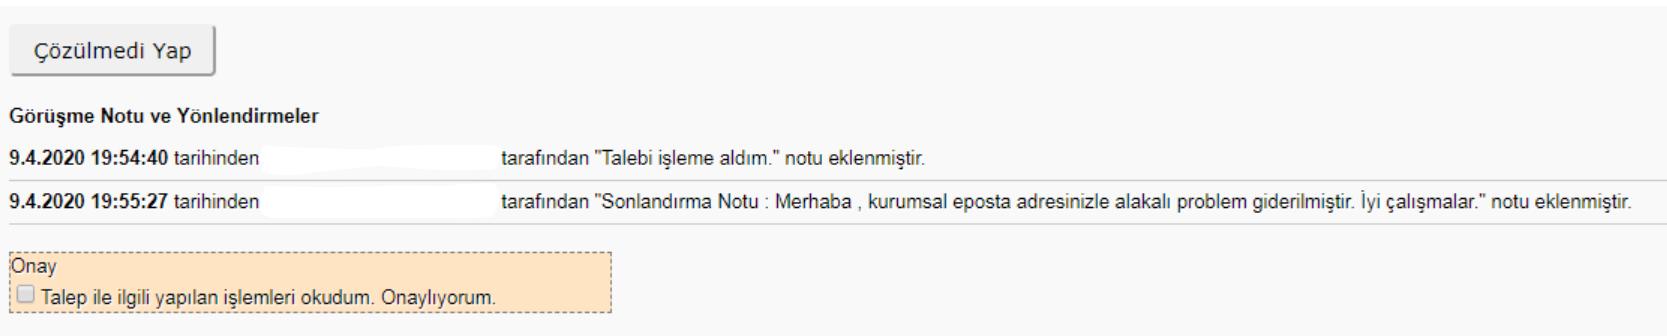 yd10.png